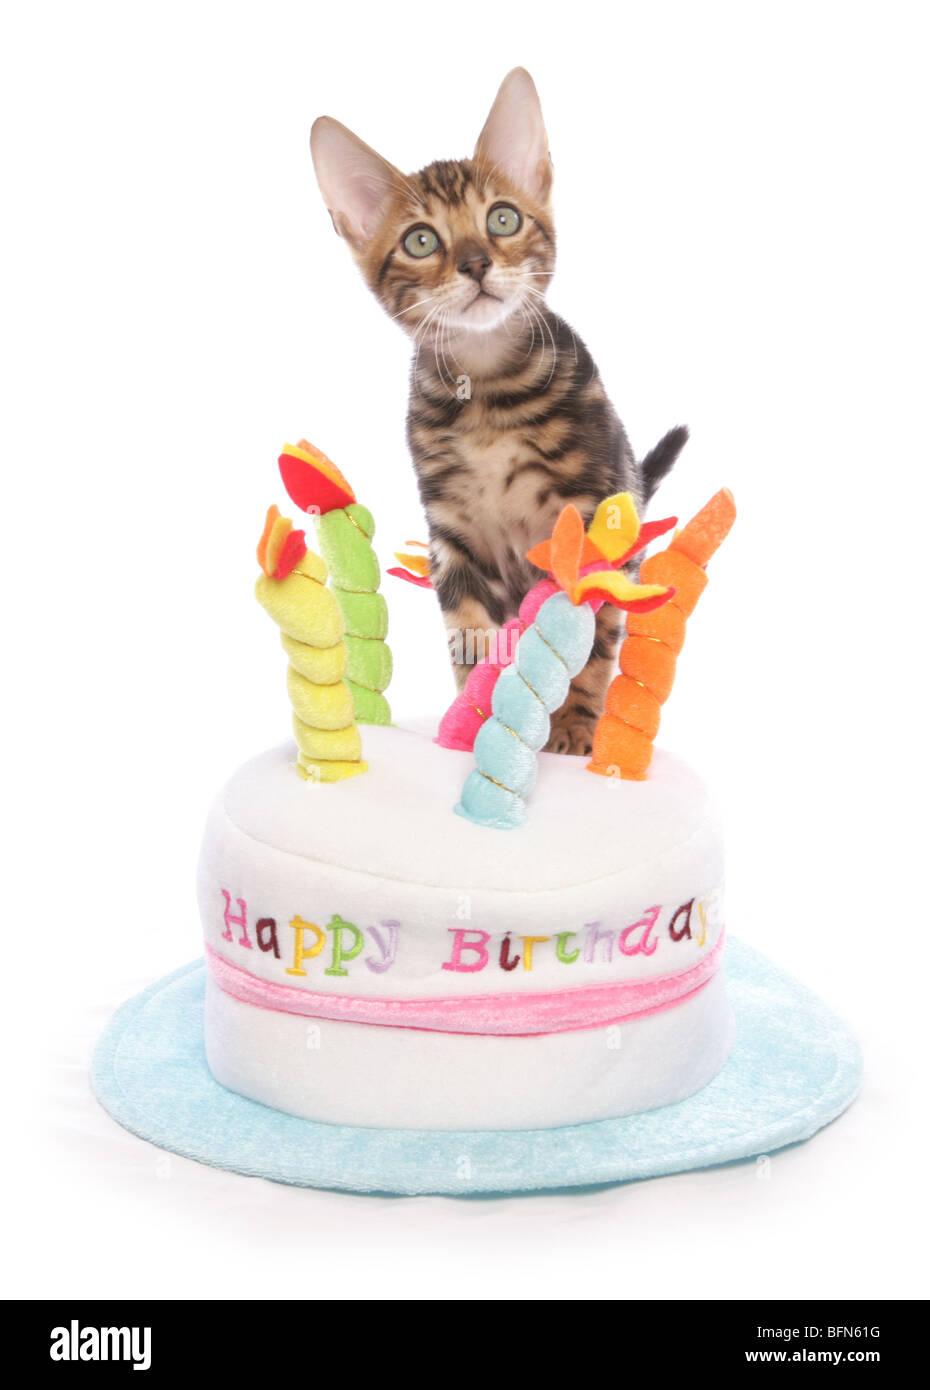 Brilliant Bengal Kitten On Birthday Cake Hat Single Young Male Studio Stock Funny Birthday Cards Online Inifofree Goldxyz